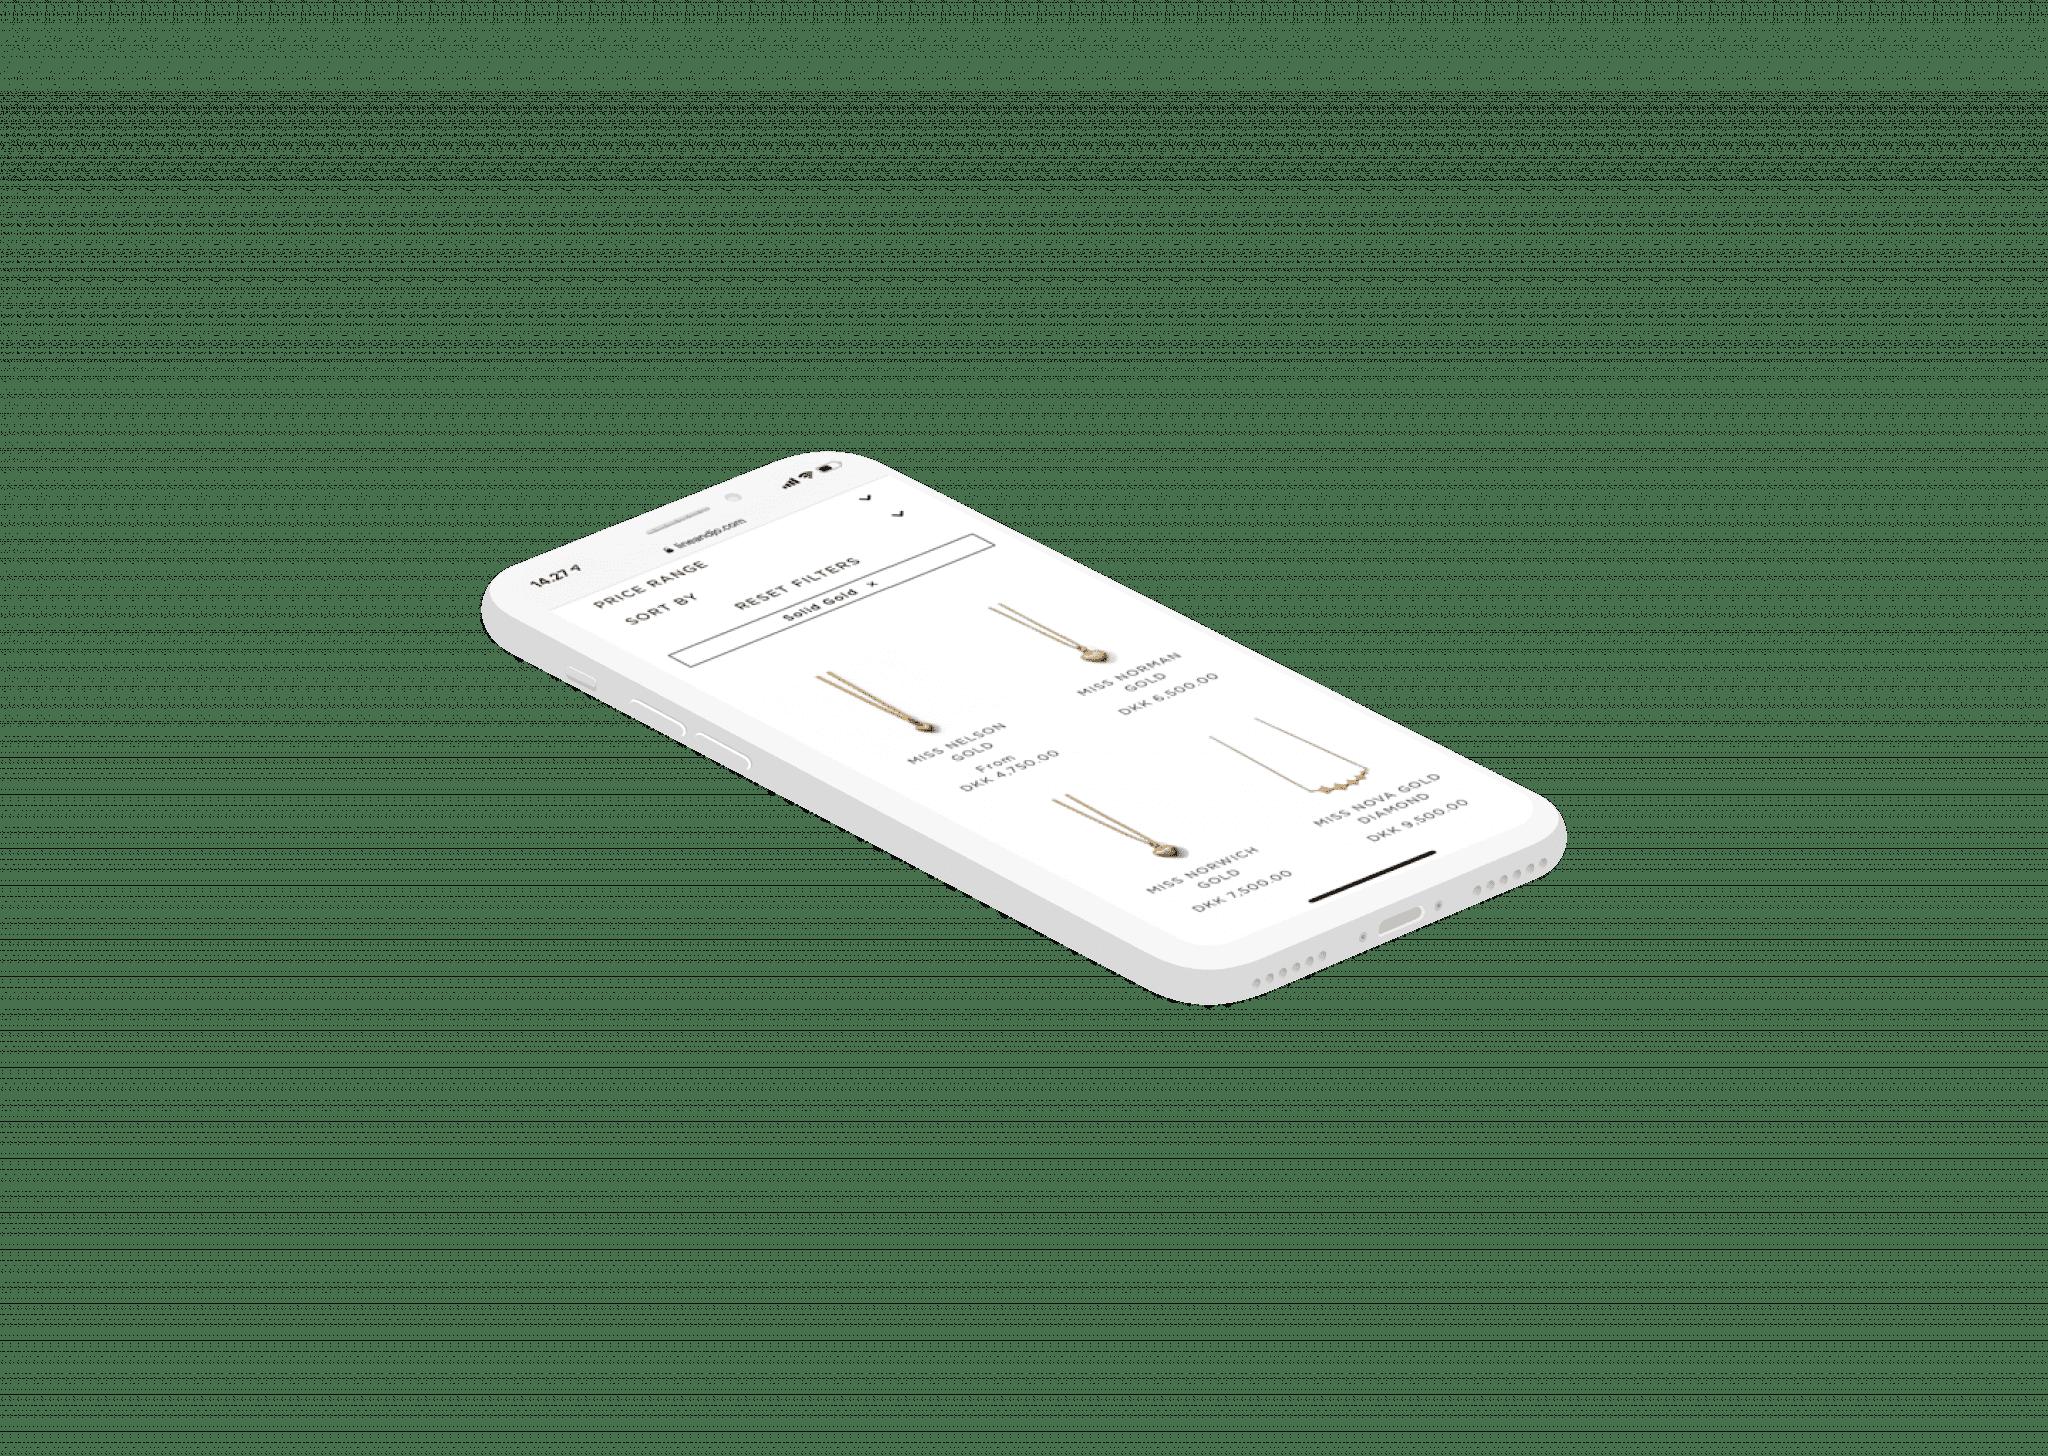 Line_Jo_2- Iphone X@2x